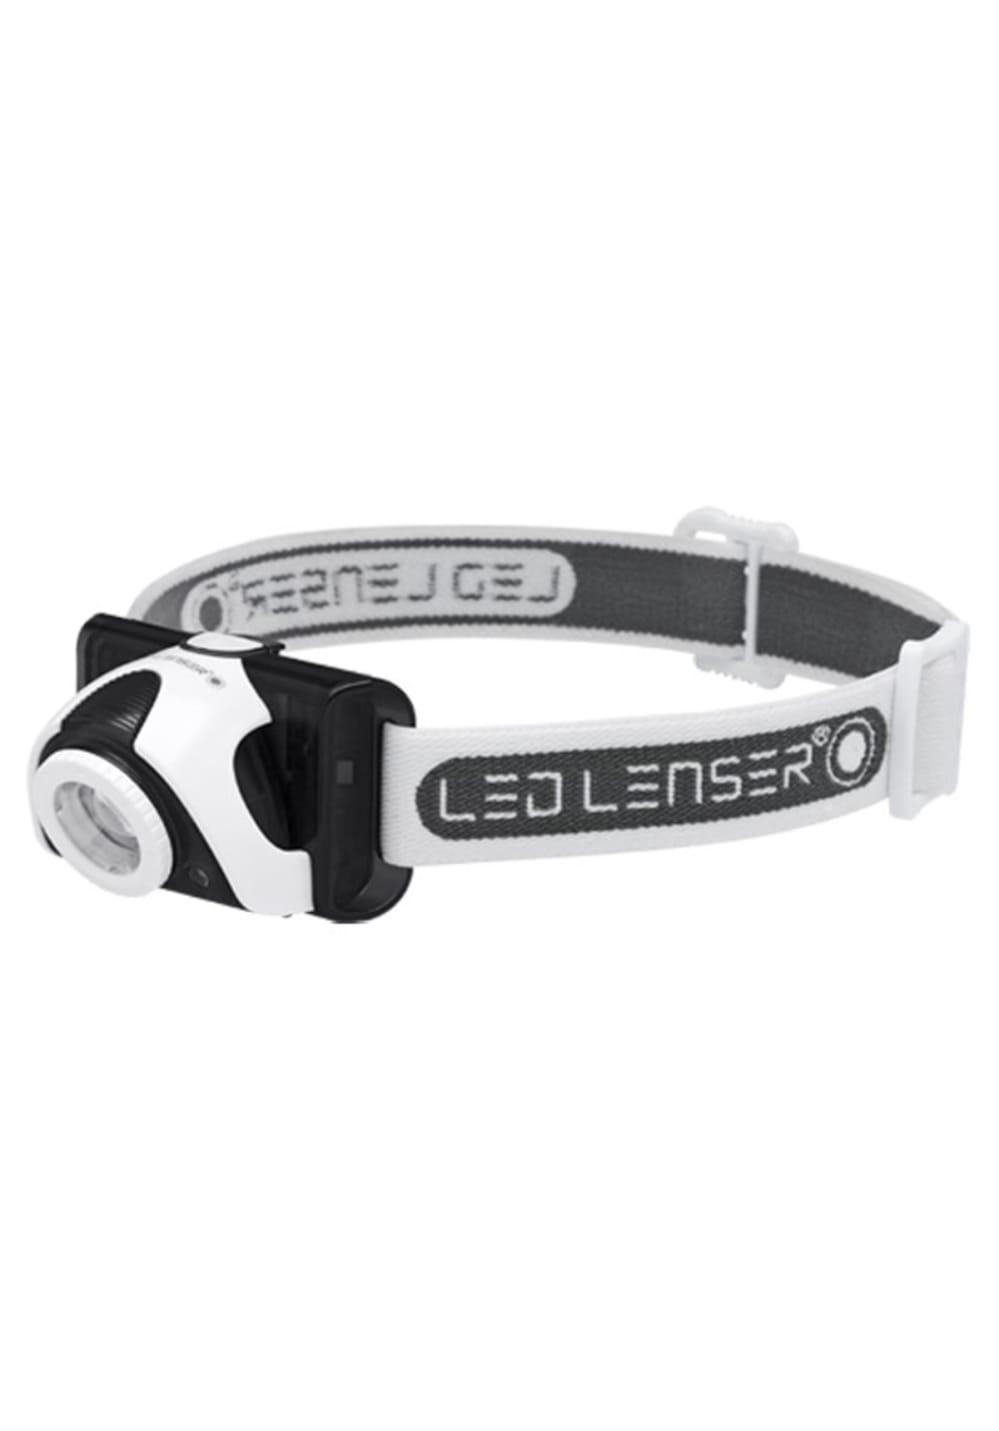 LED Lenser SEO 5 Reflektion / Beleuchtung - Grau